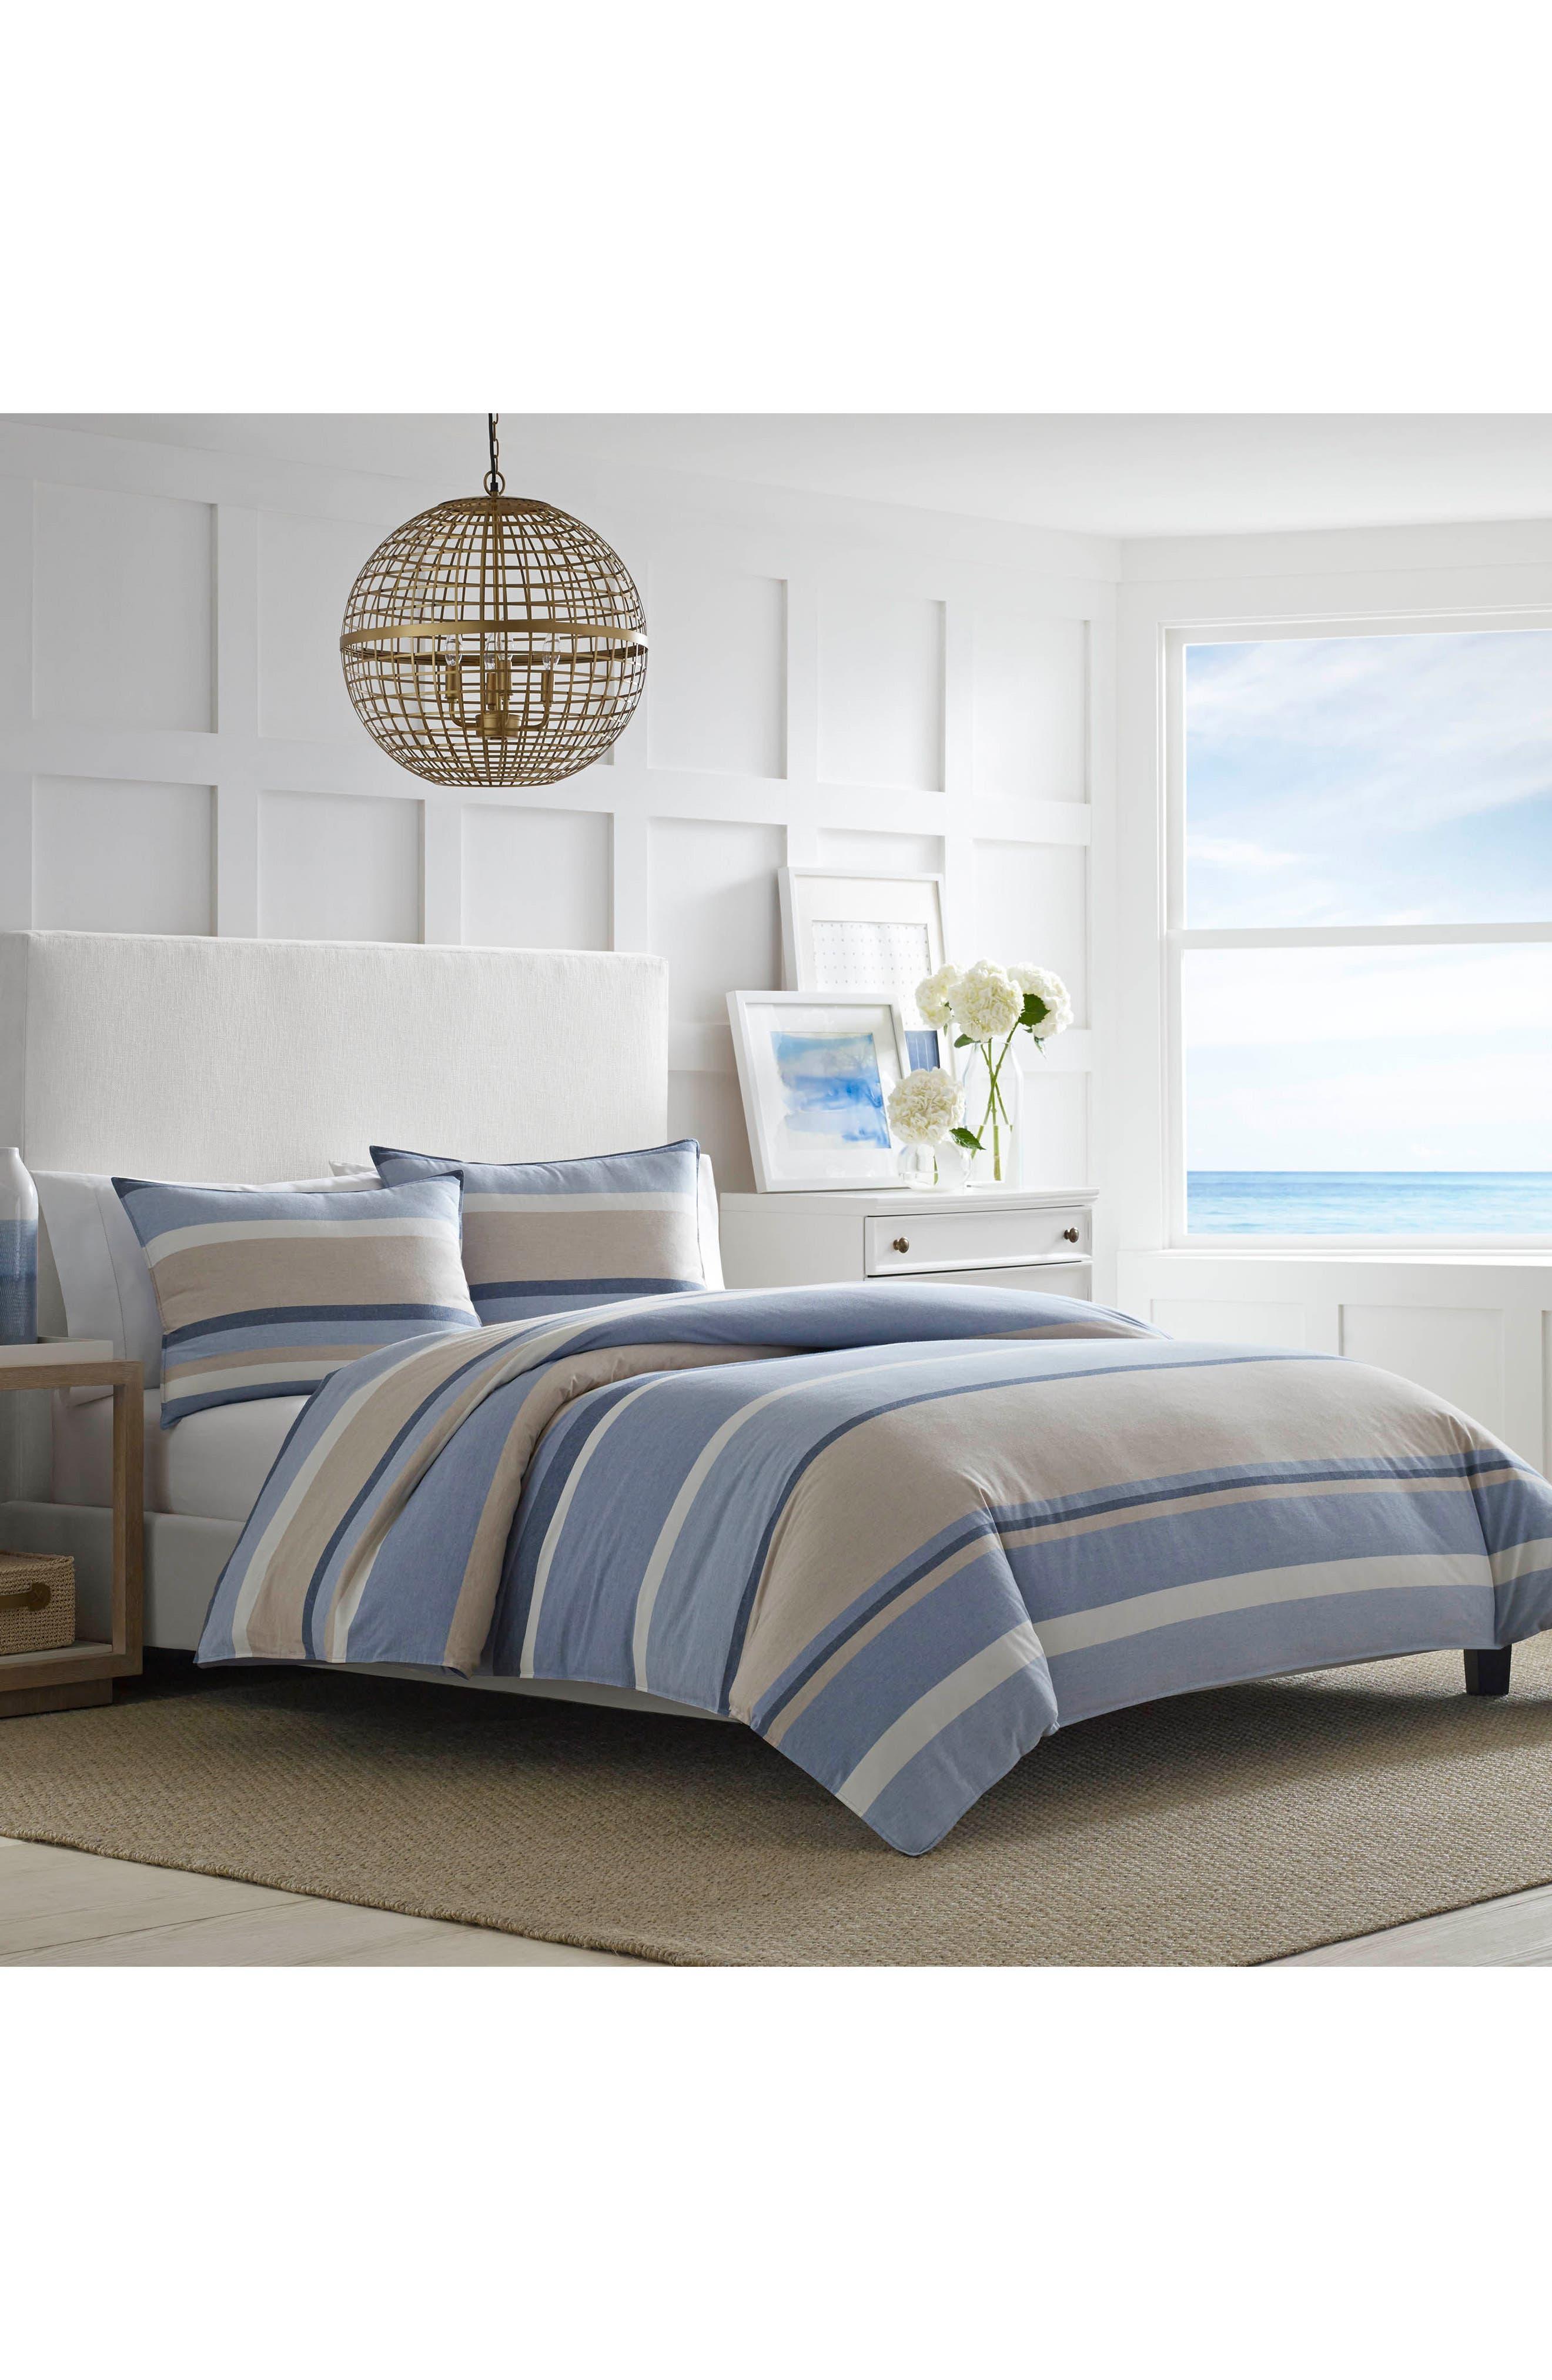 Abbot Comforter & Sham Set,                             Main thumbnail 1, color,                             Medium Blue